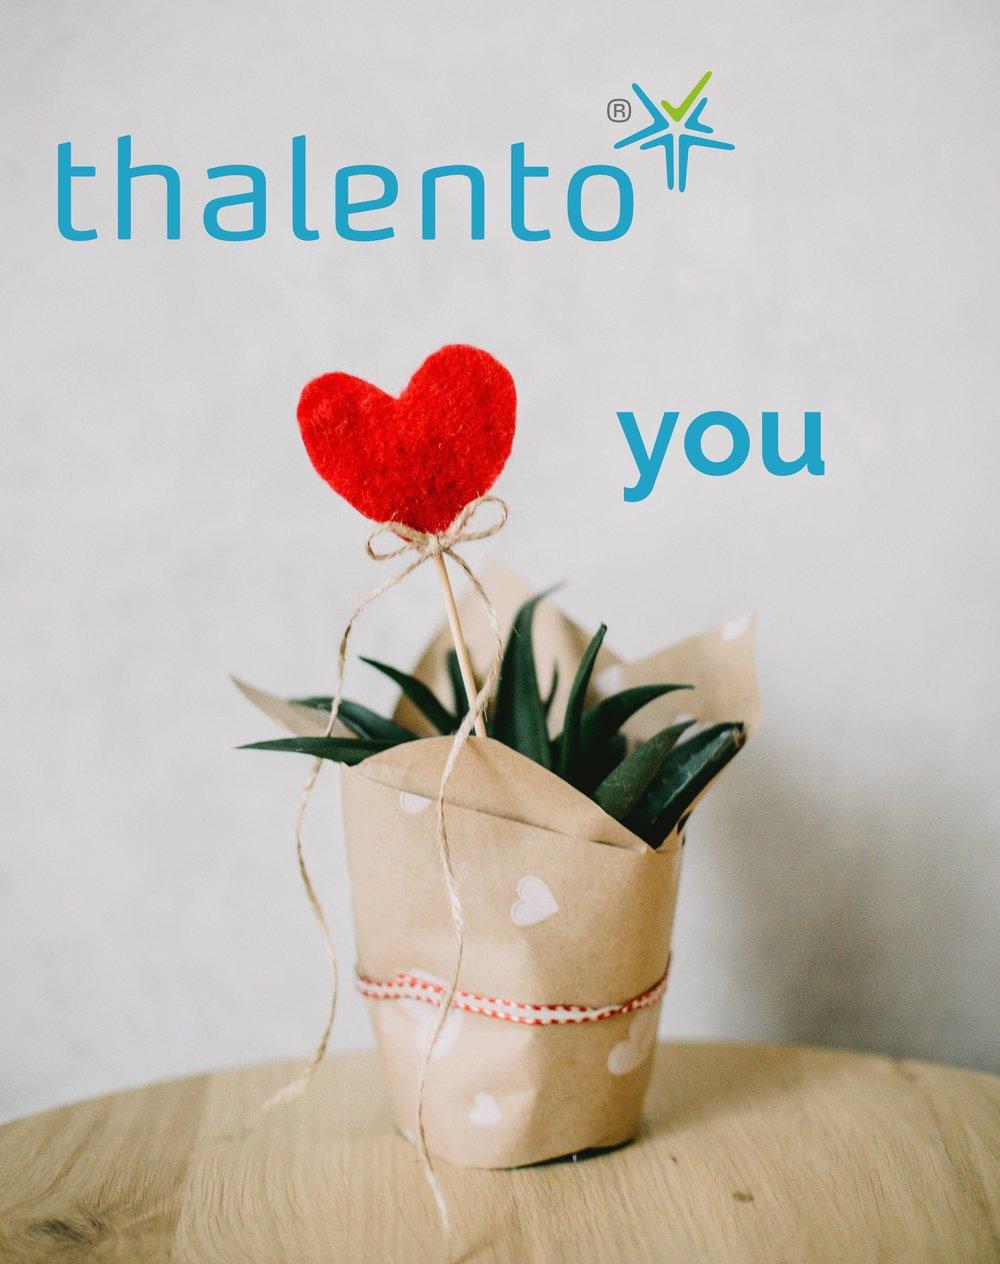 Thalento-loves-you_1.jpg